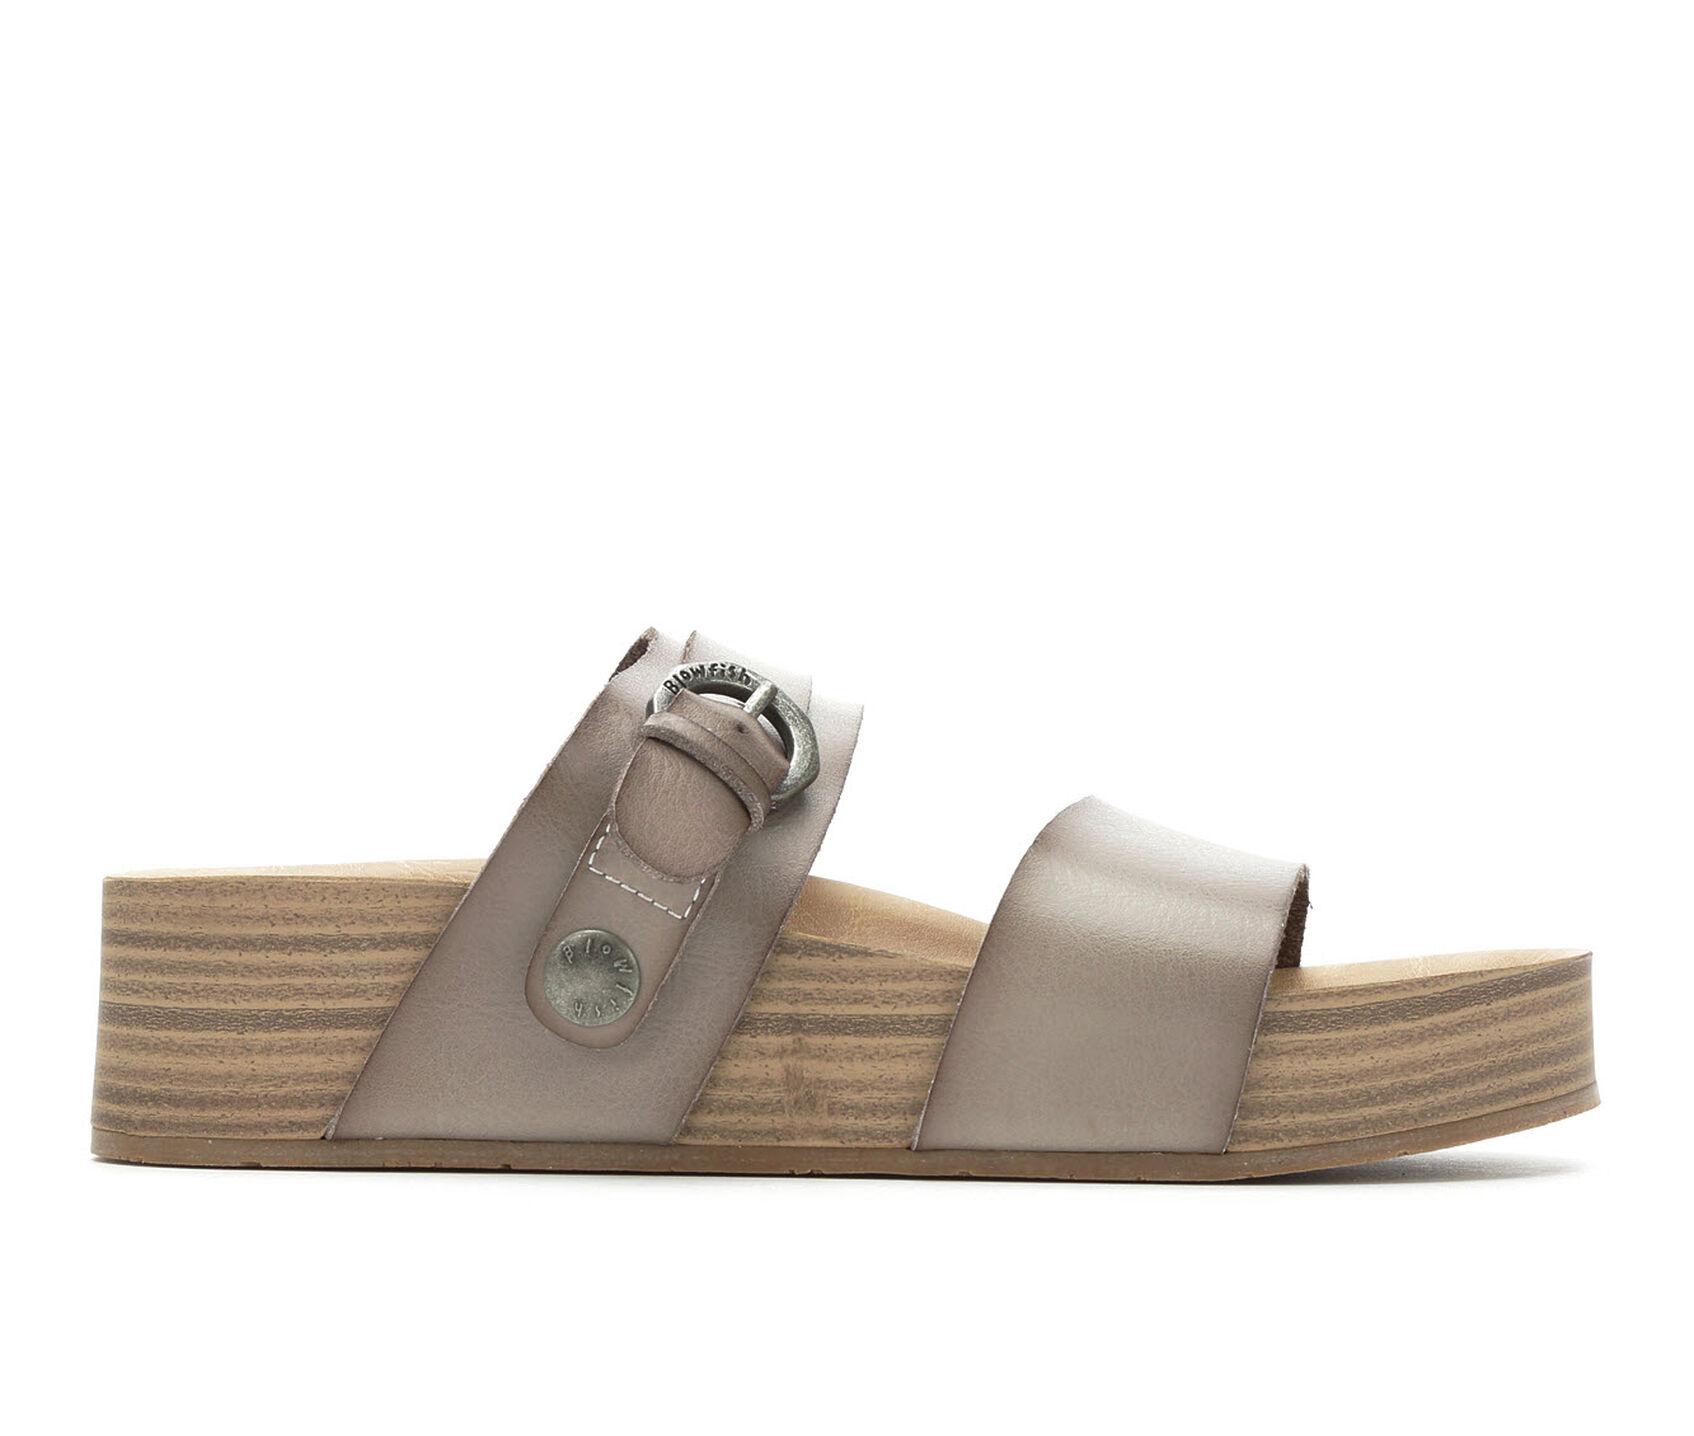 b1ba28d95328d Women's Blowfish Malibu Marge Flatform Sandals